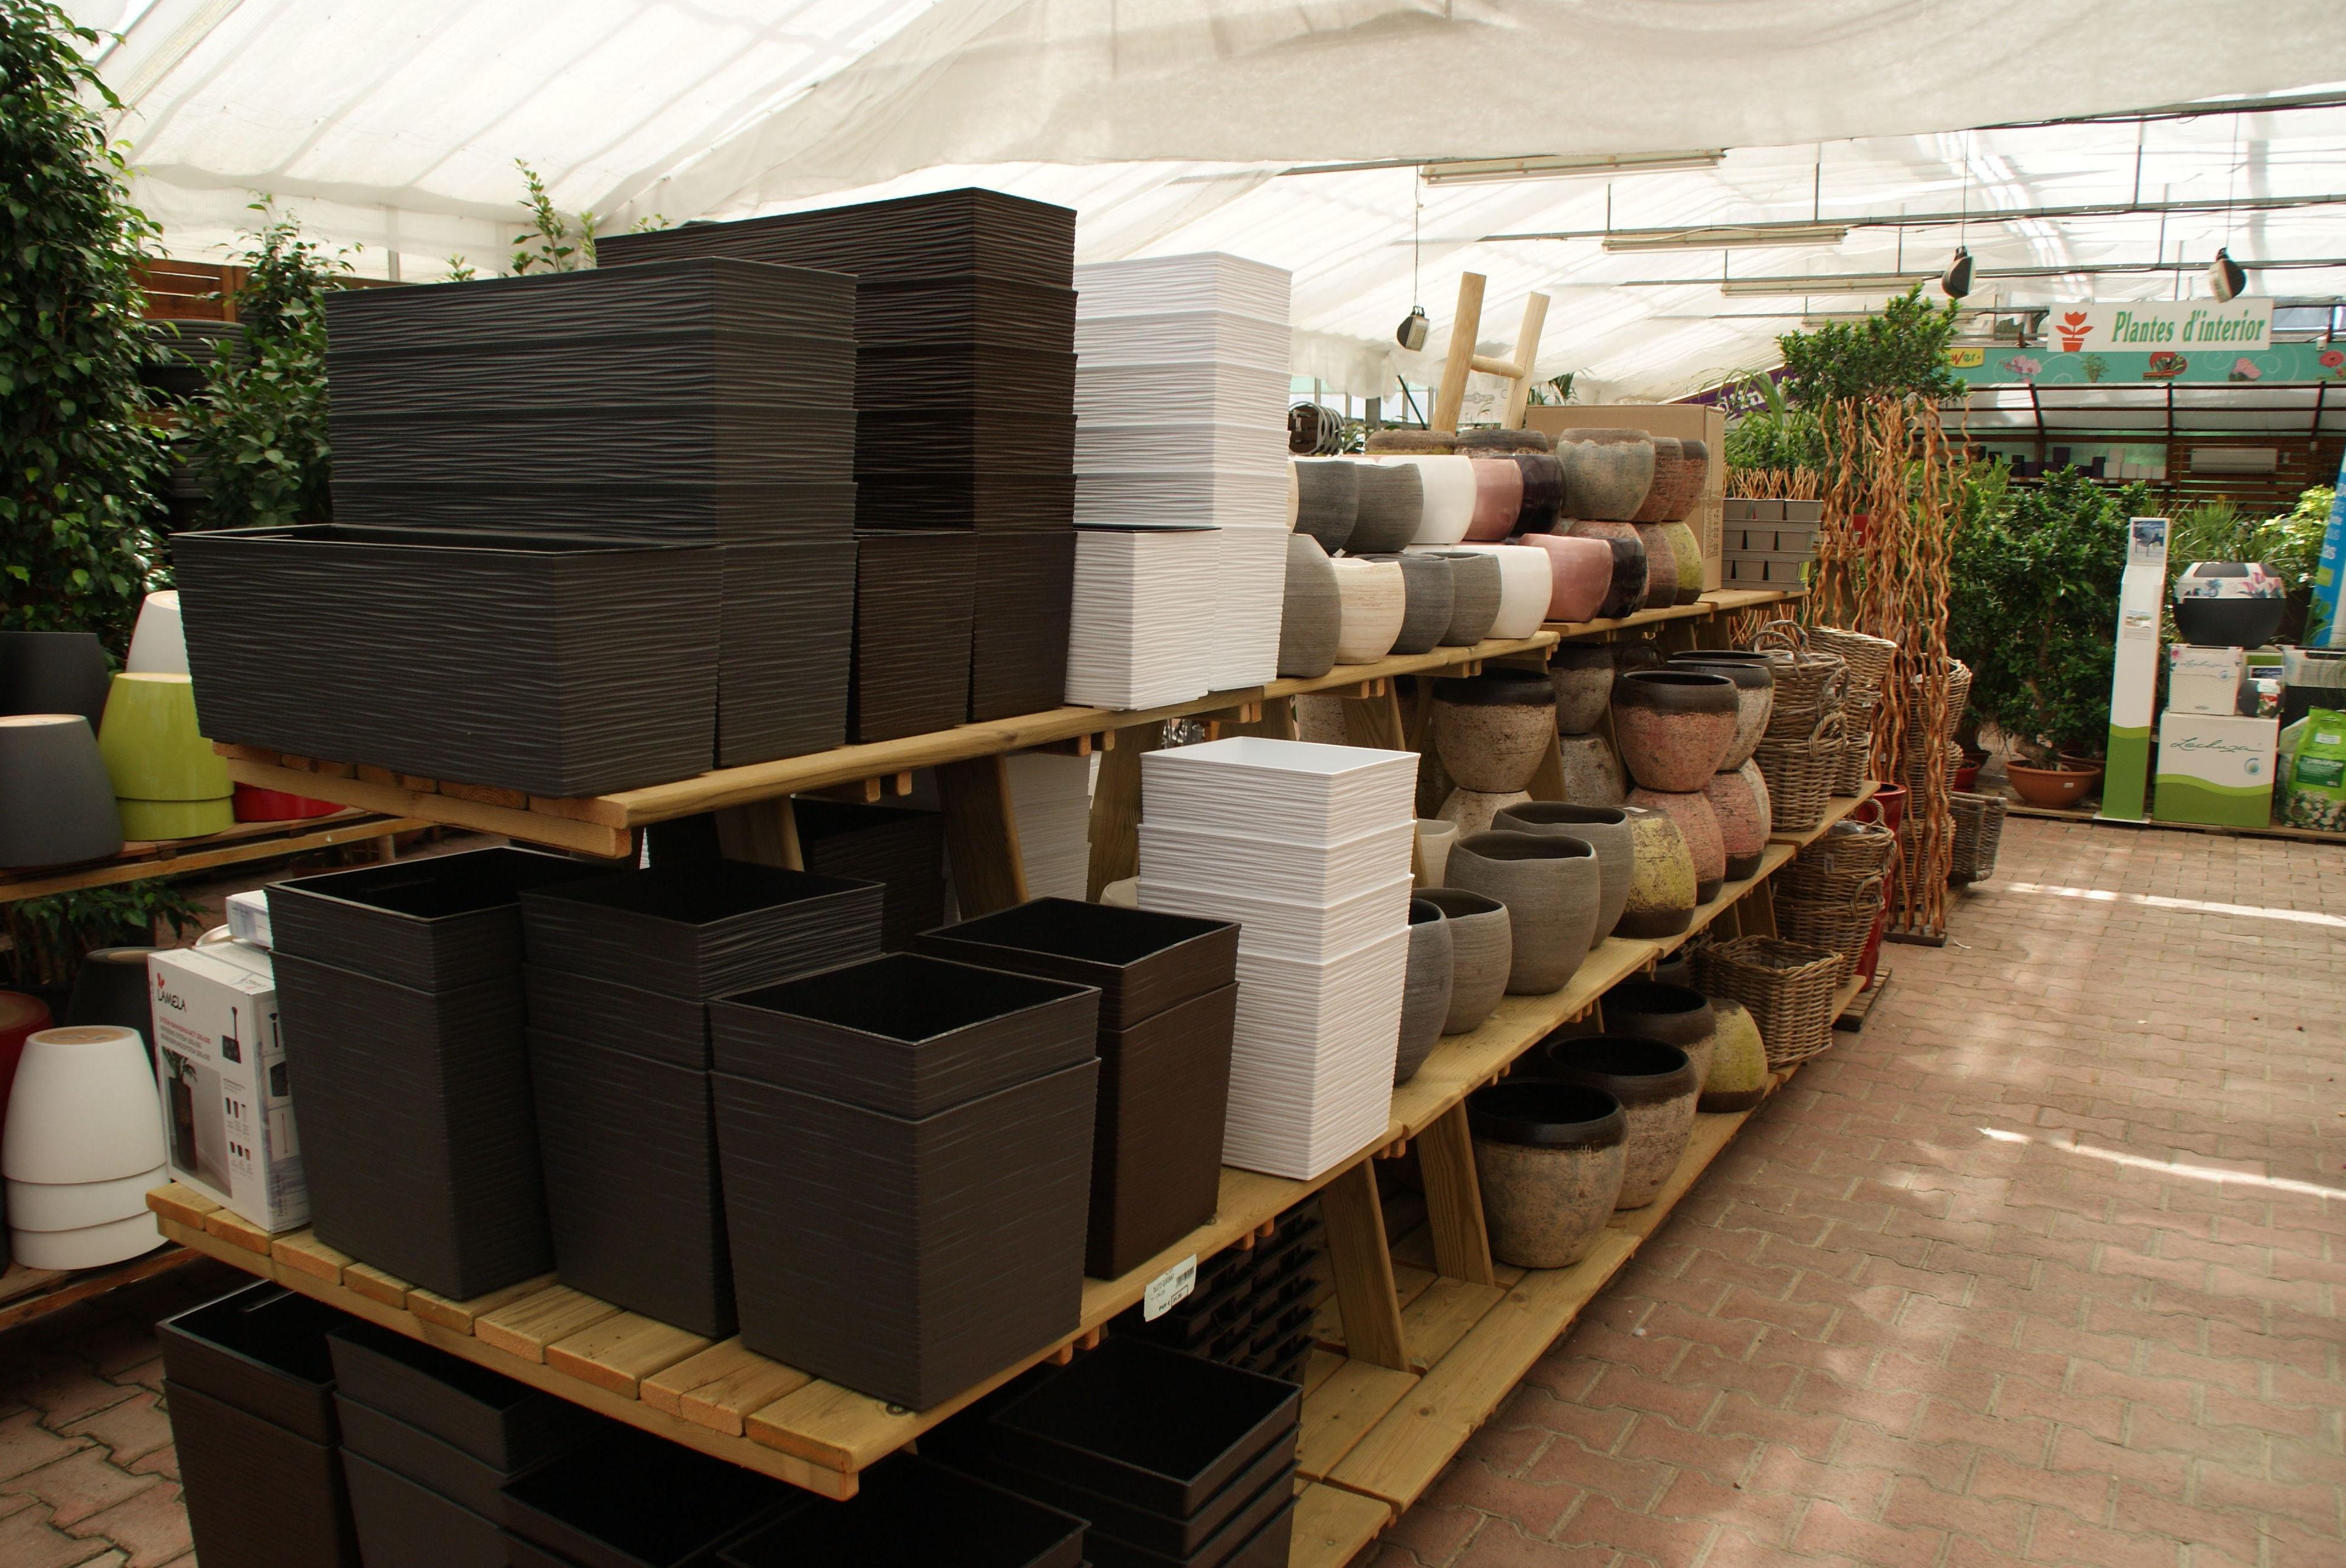 Ceramics: Catalogue de Mercajardí